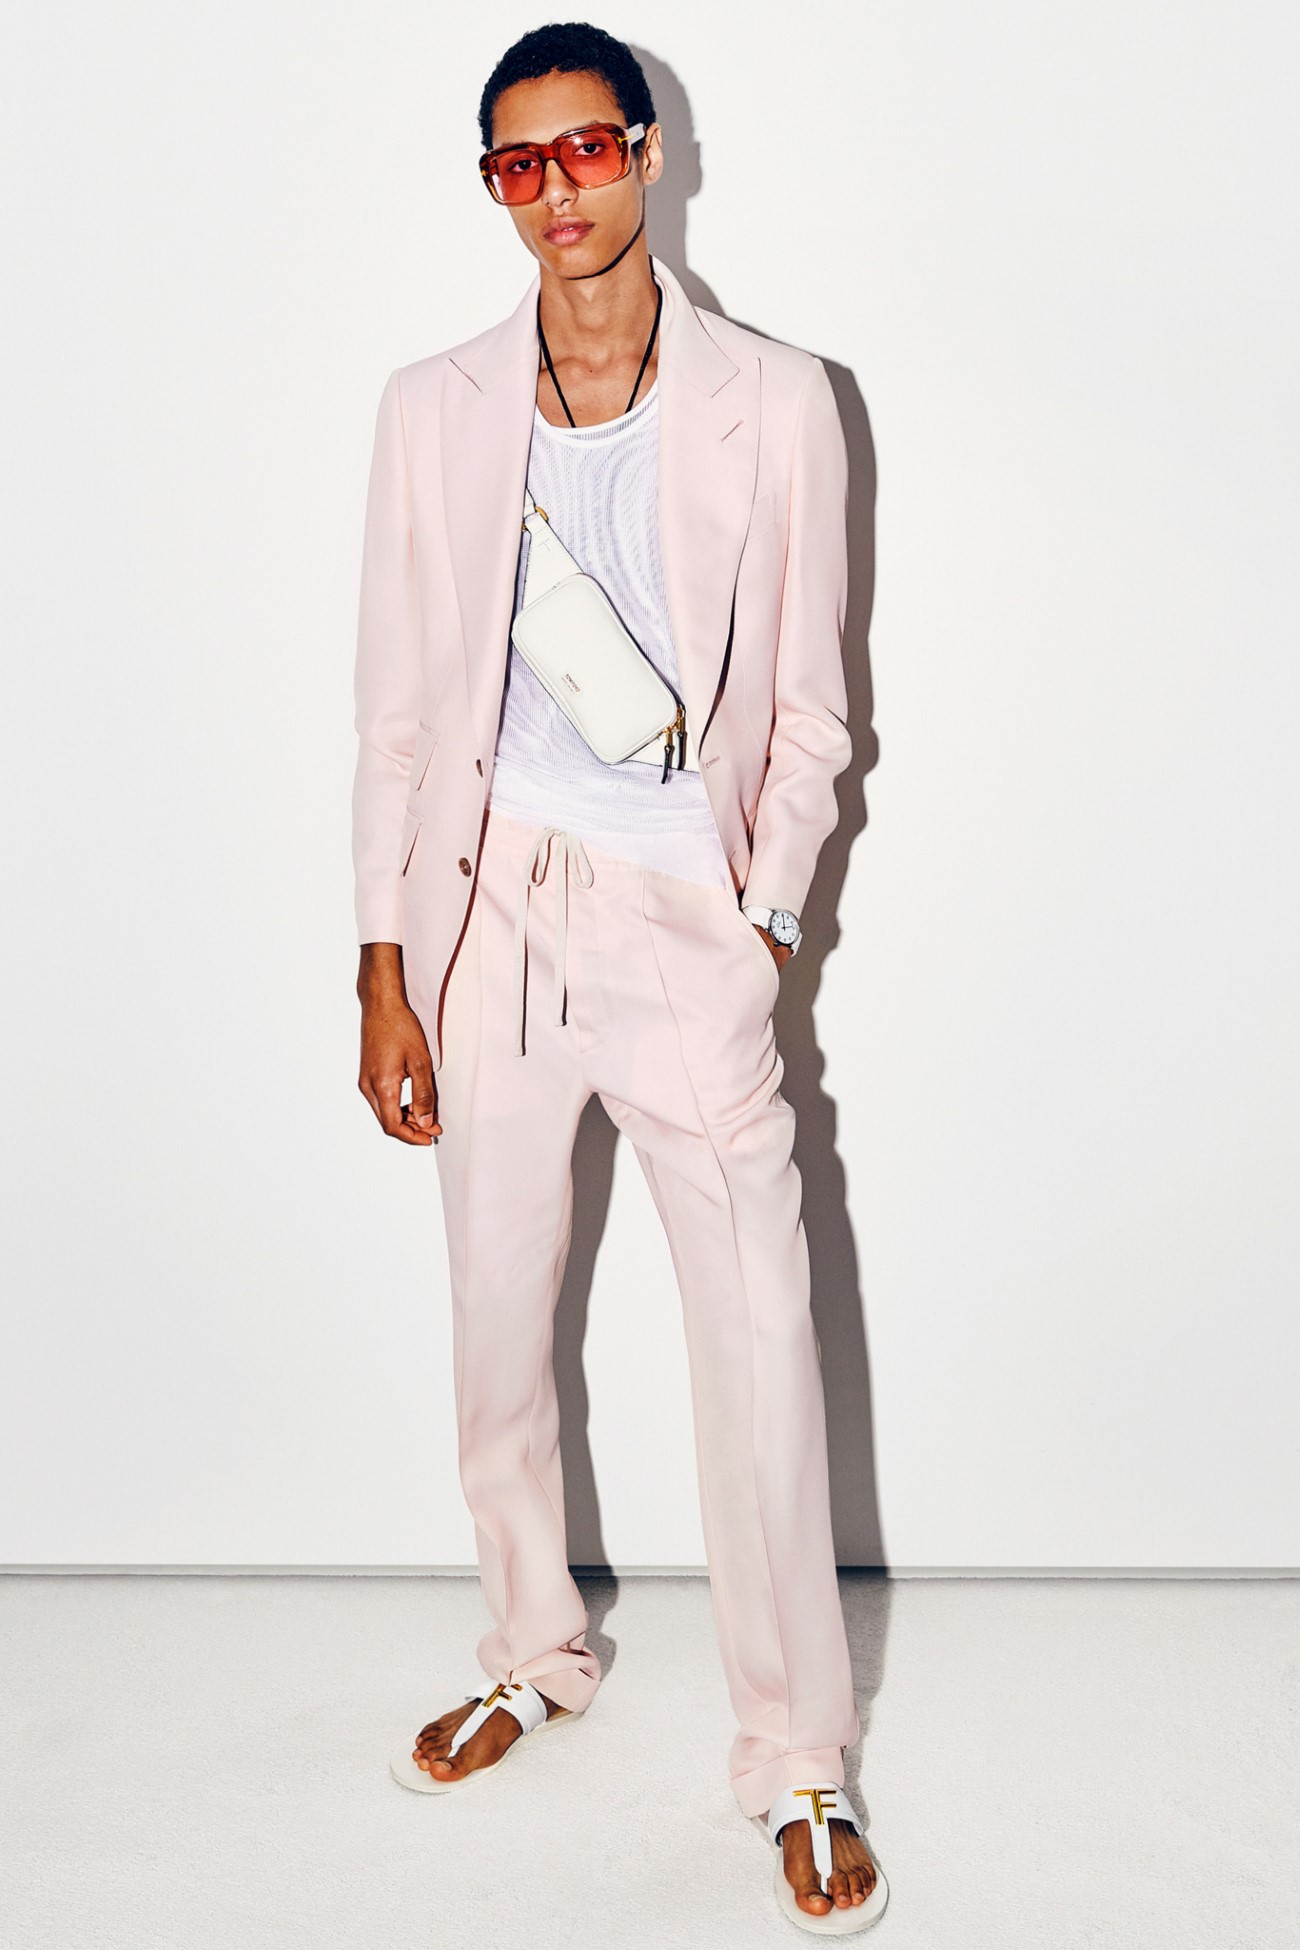 Tom Ford Men's - Spring Summer 2020 - New York Fashion Week